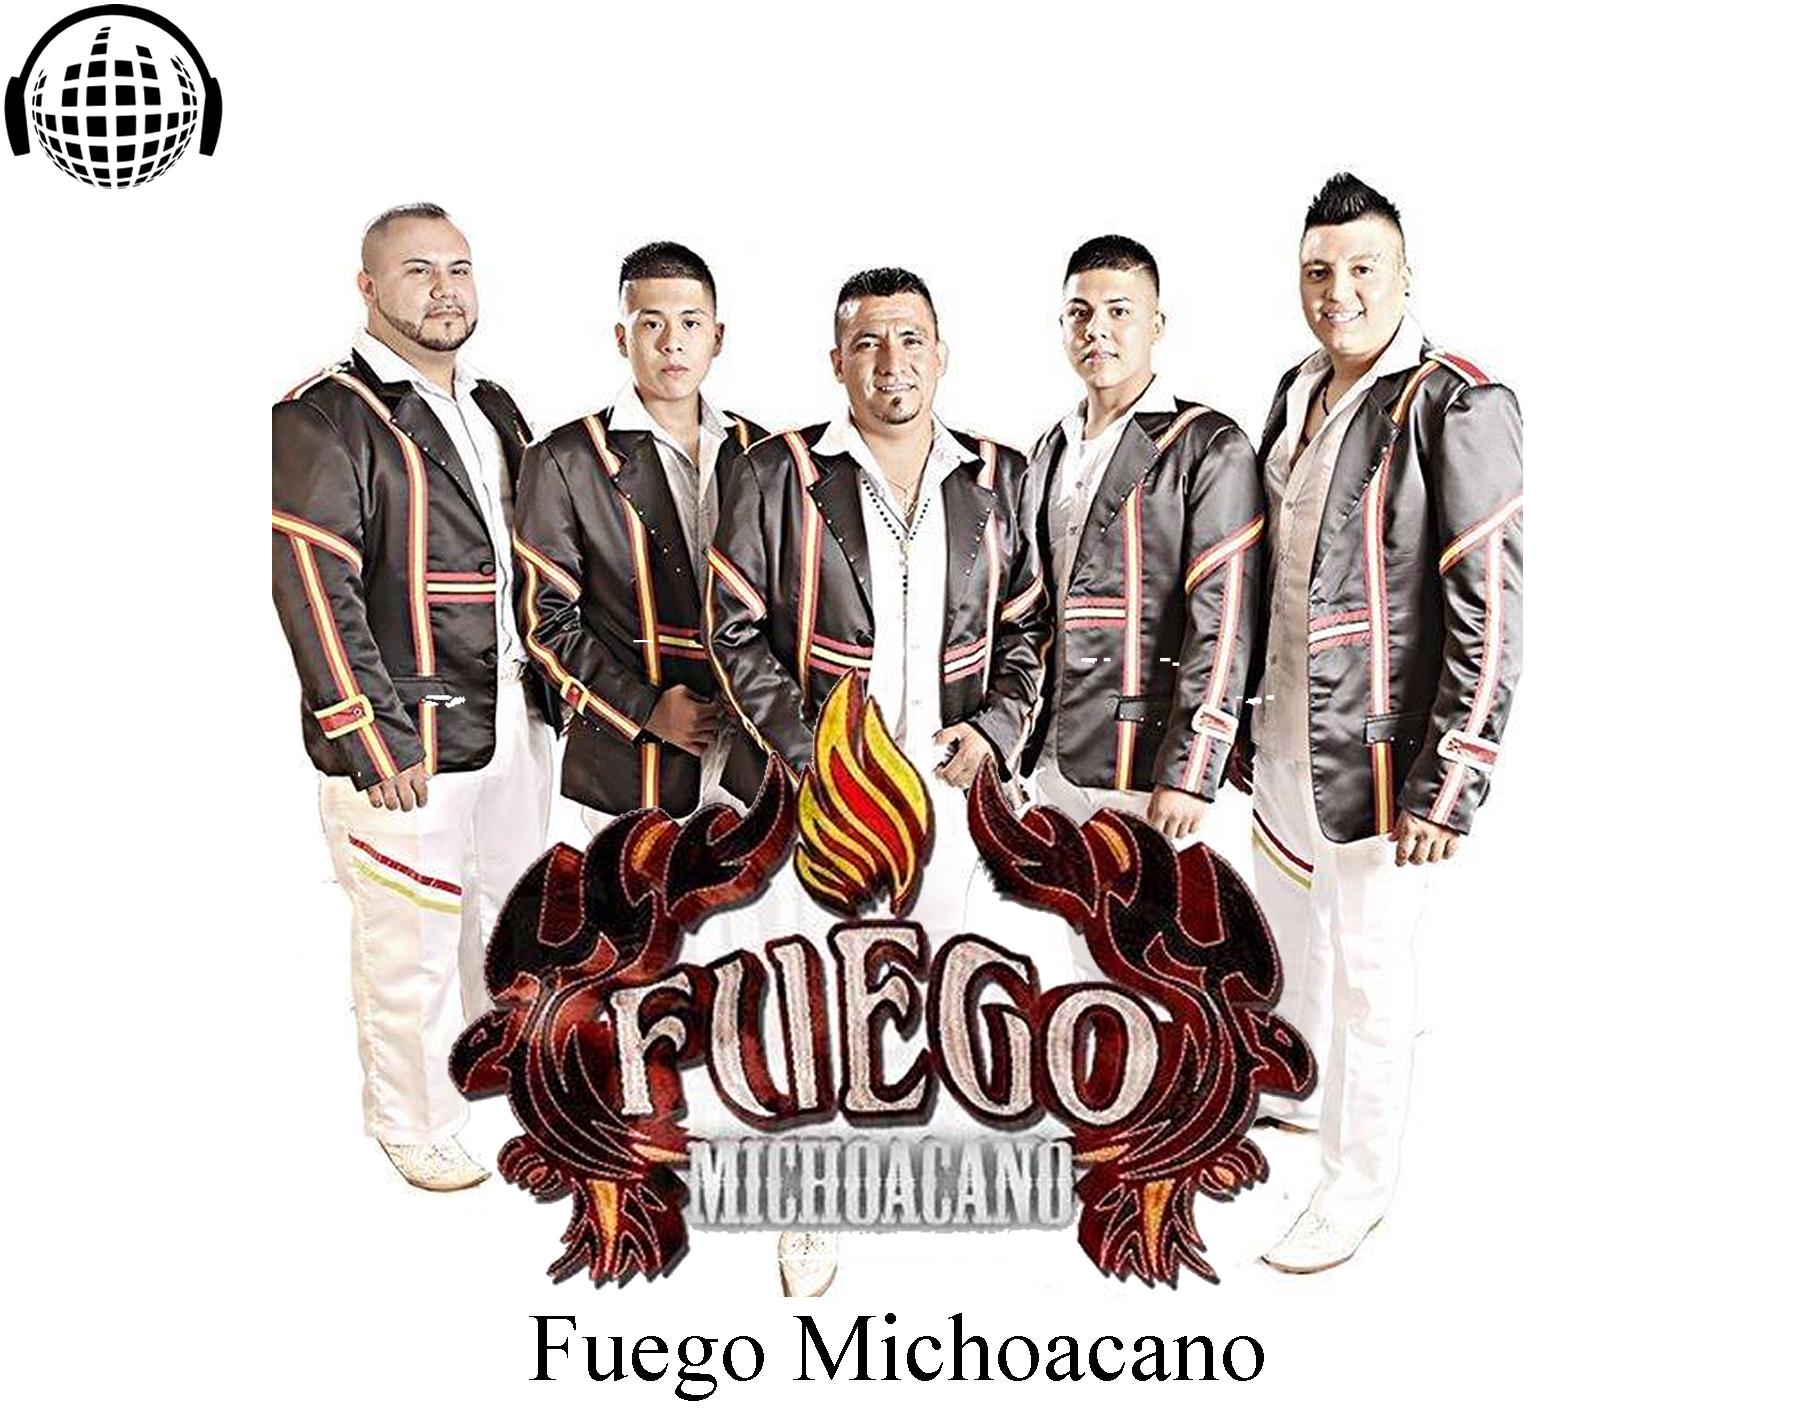 Fuego Michoacano.png